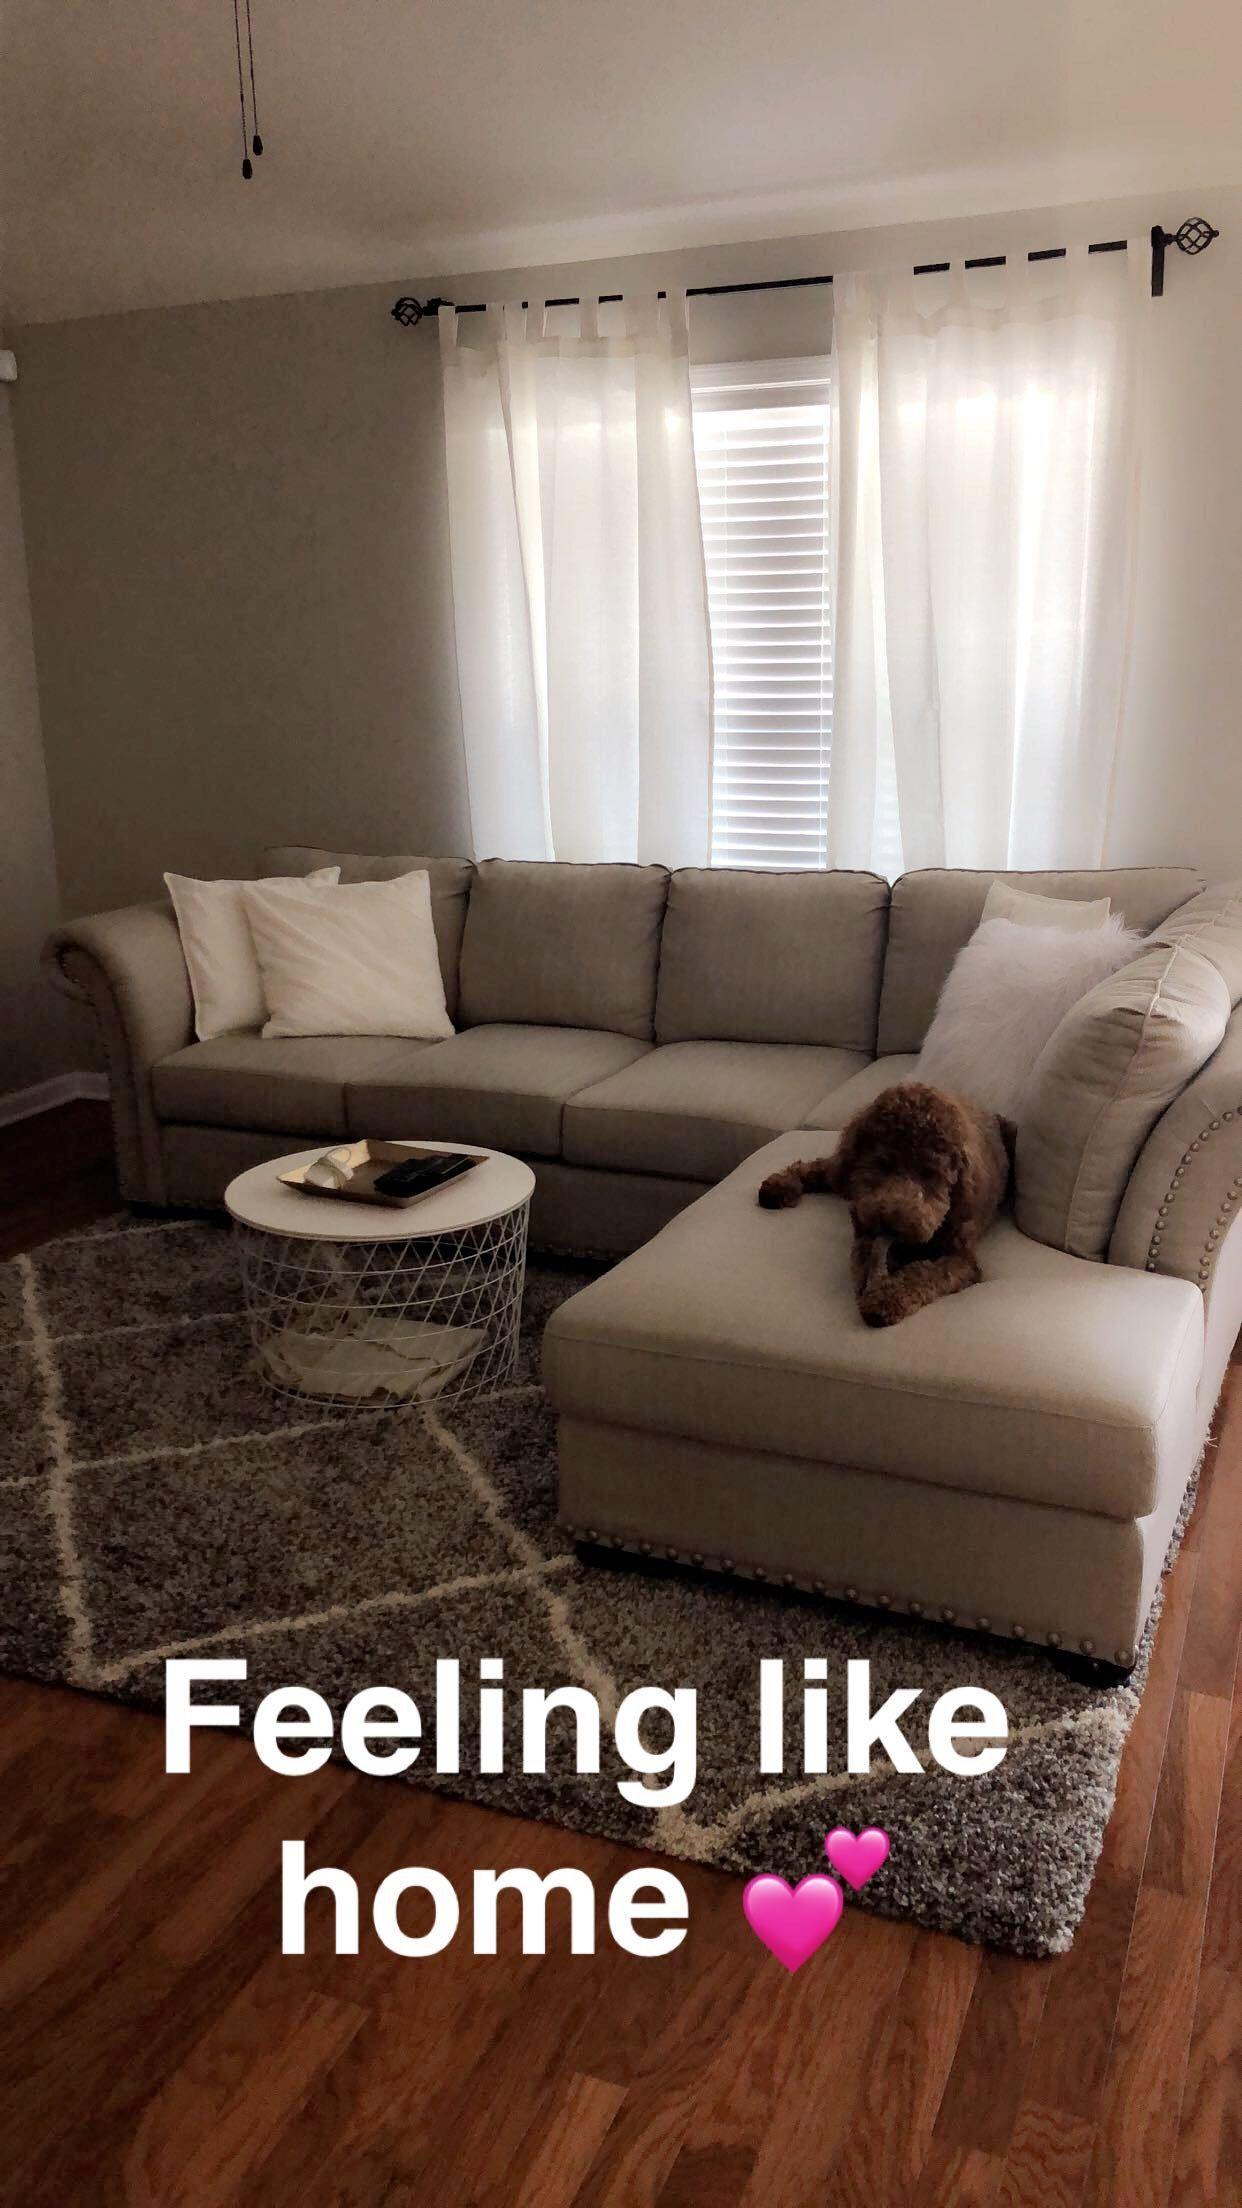 Uptight Lazy Boy Furniture Living Room #furnitureindonesia #HomeFurnitureWooden #smallapartmentlivingroom